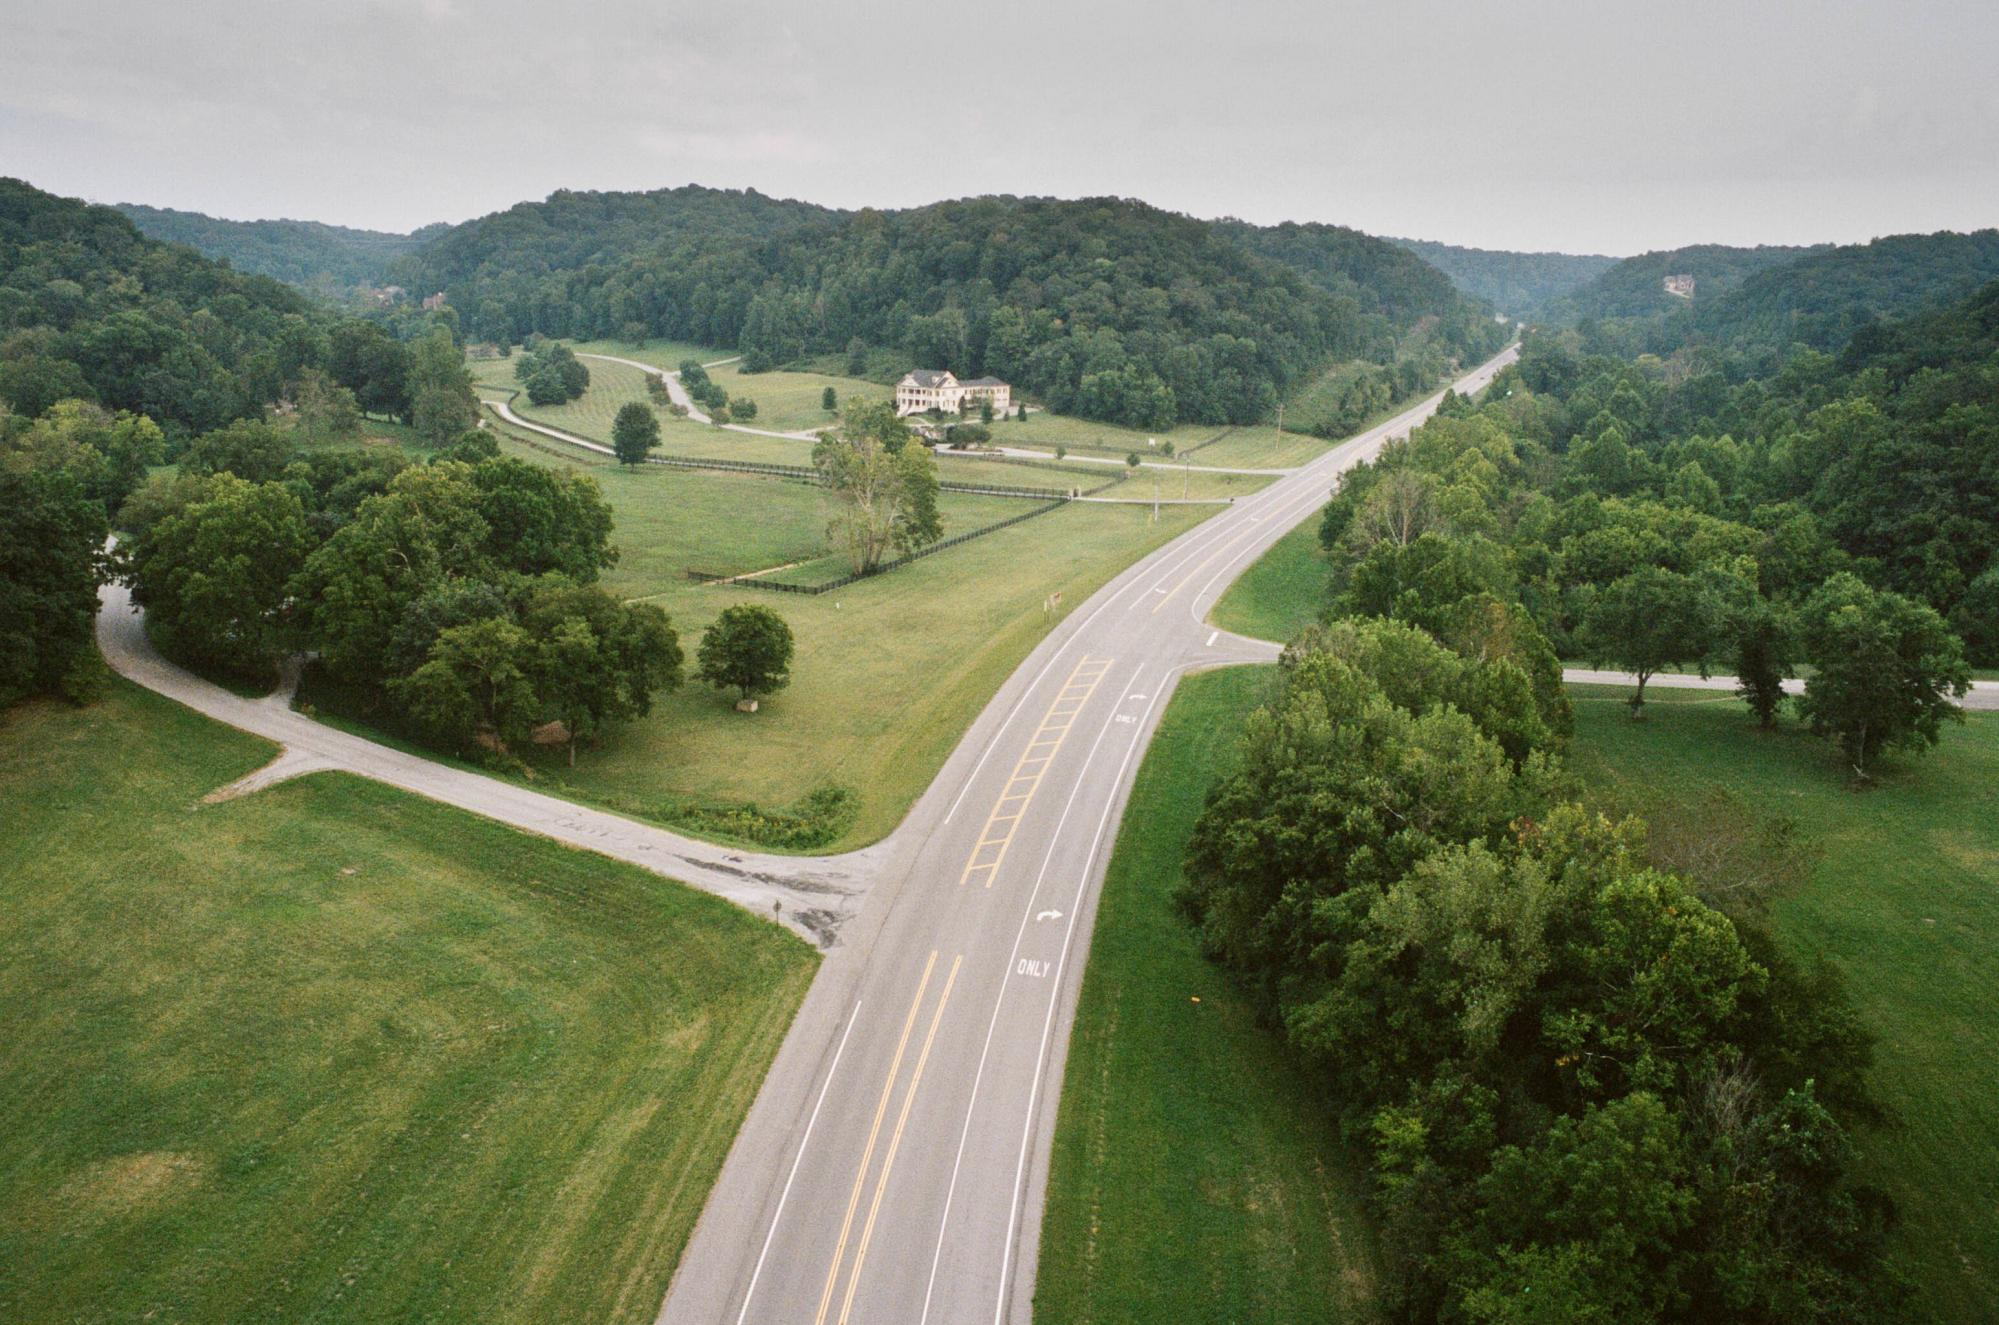 Highway 96 Underneath the Natchez Trace Bridge